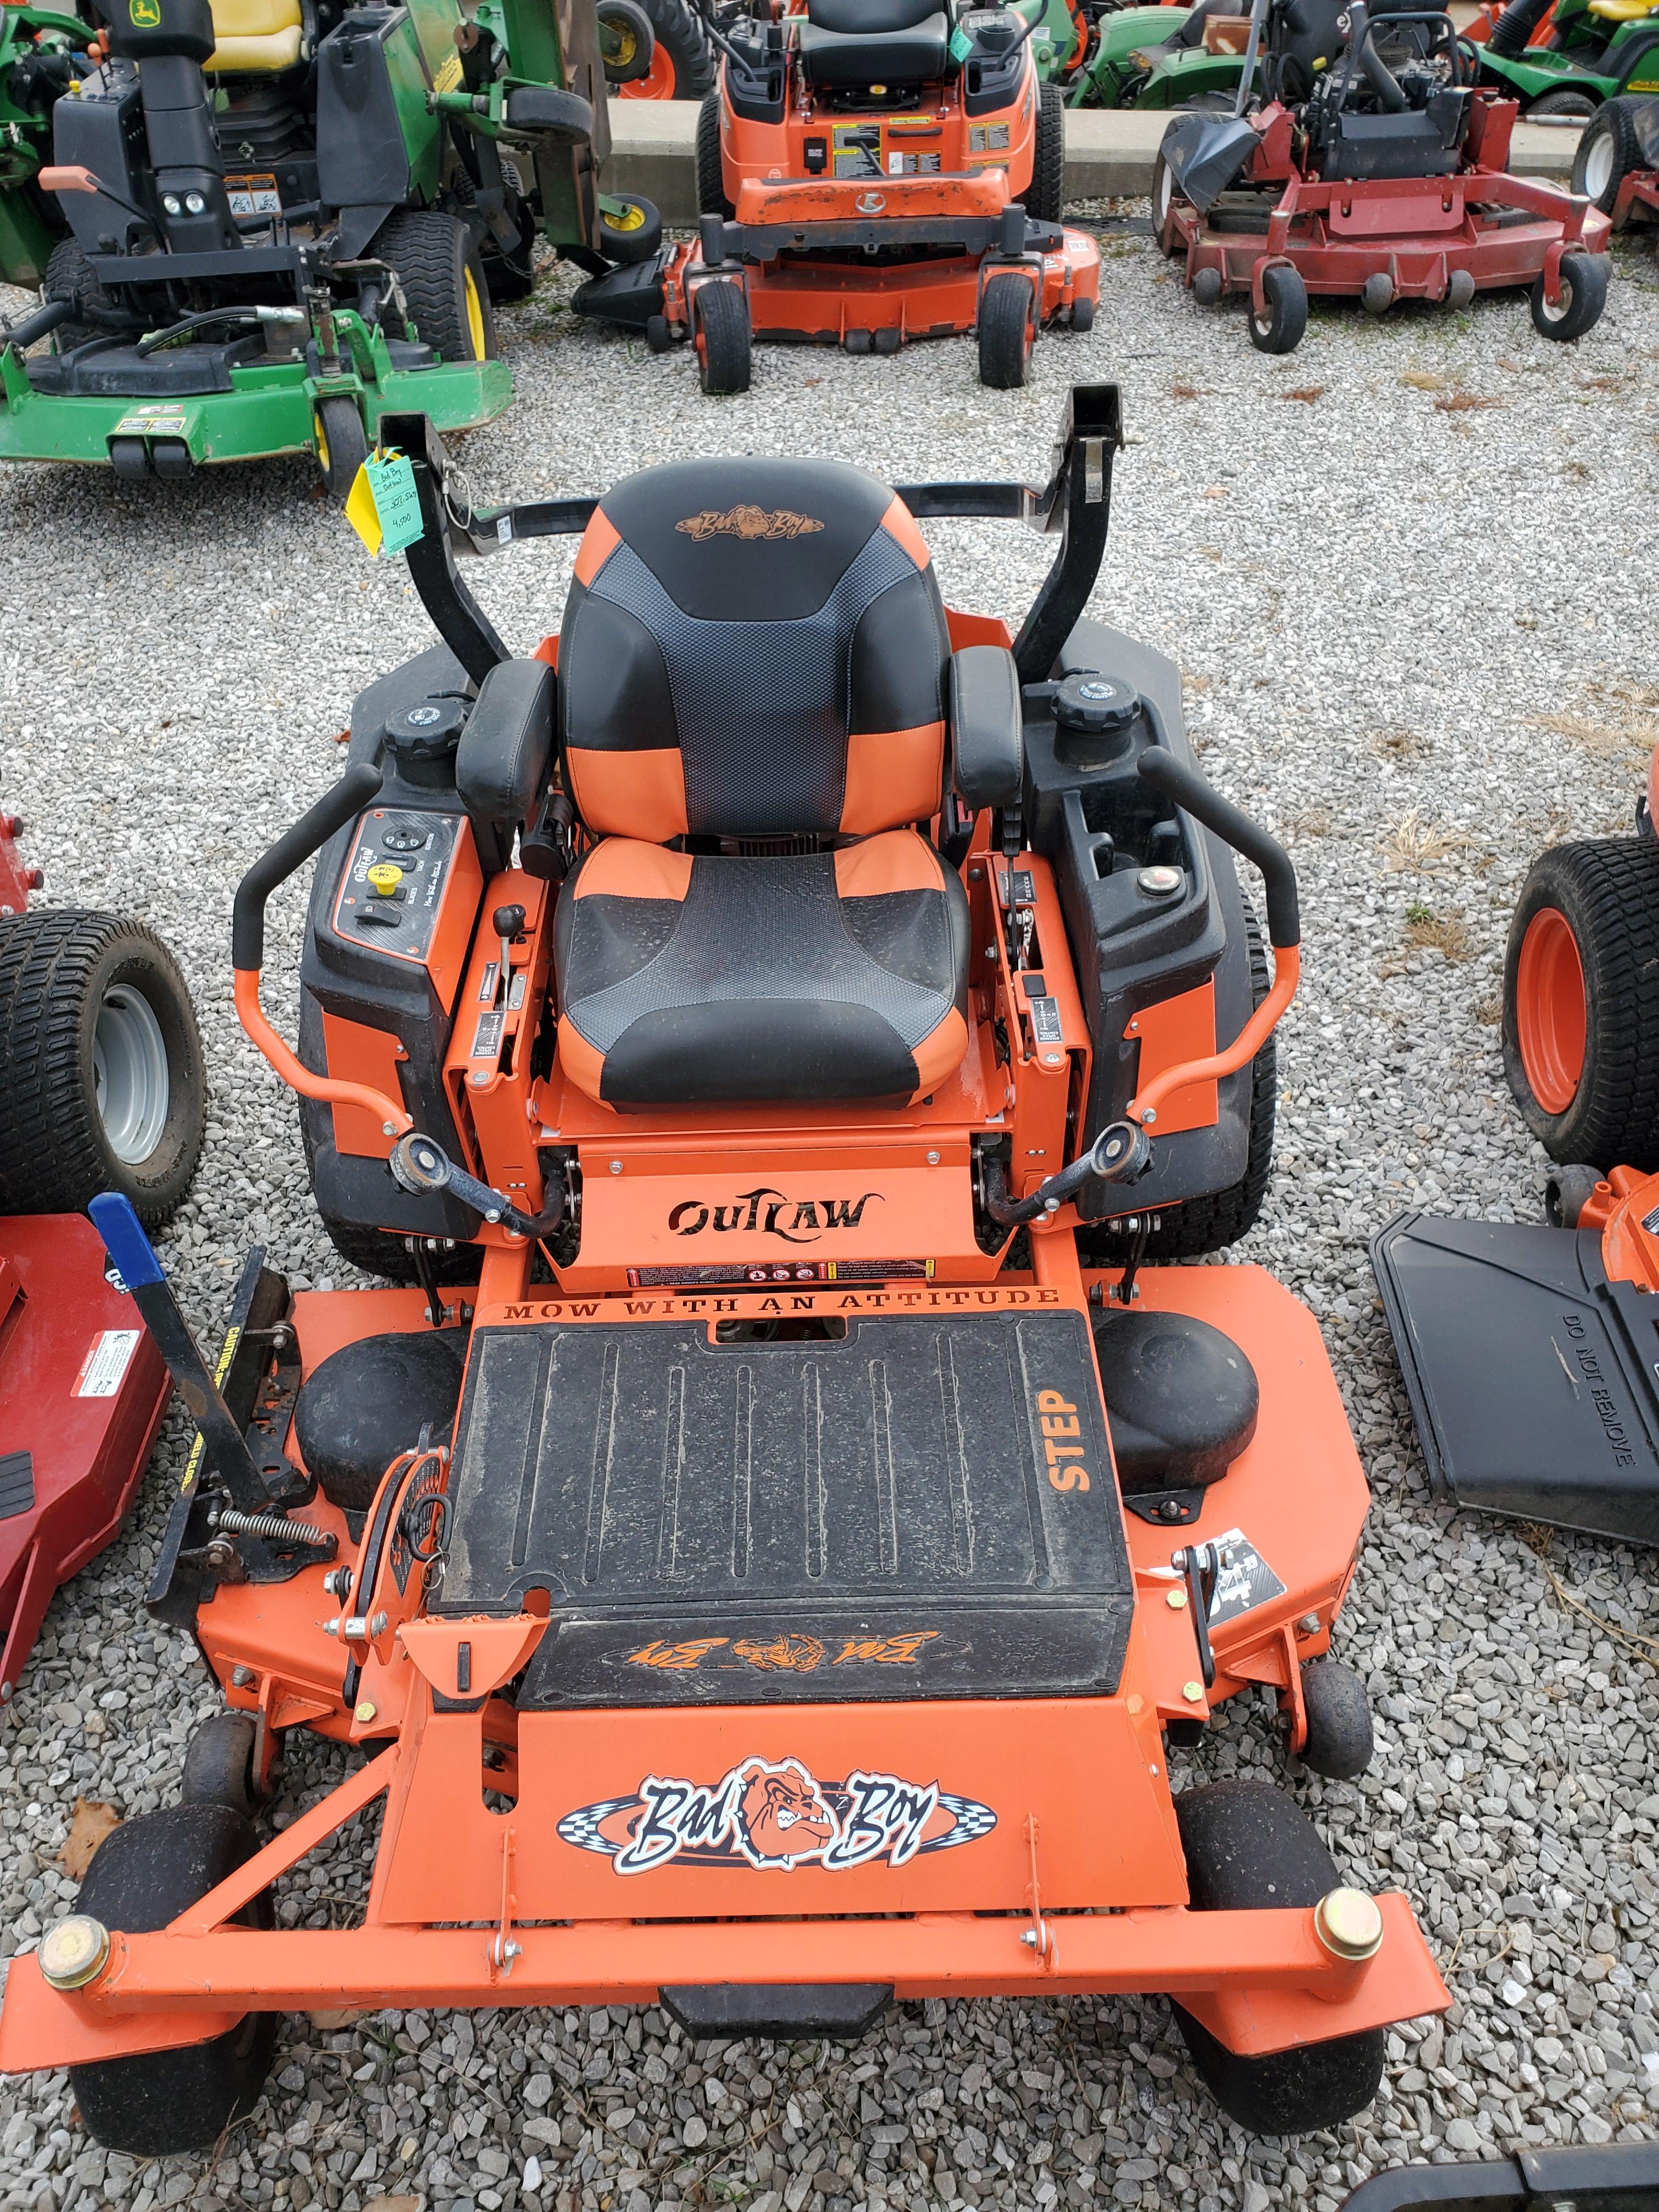 Bad Boy 5400 ATVs and Utility Vehicle